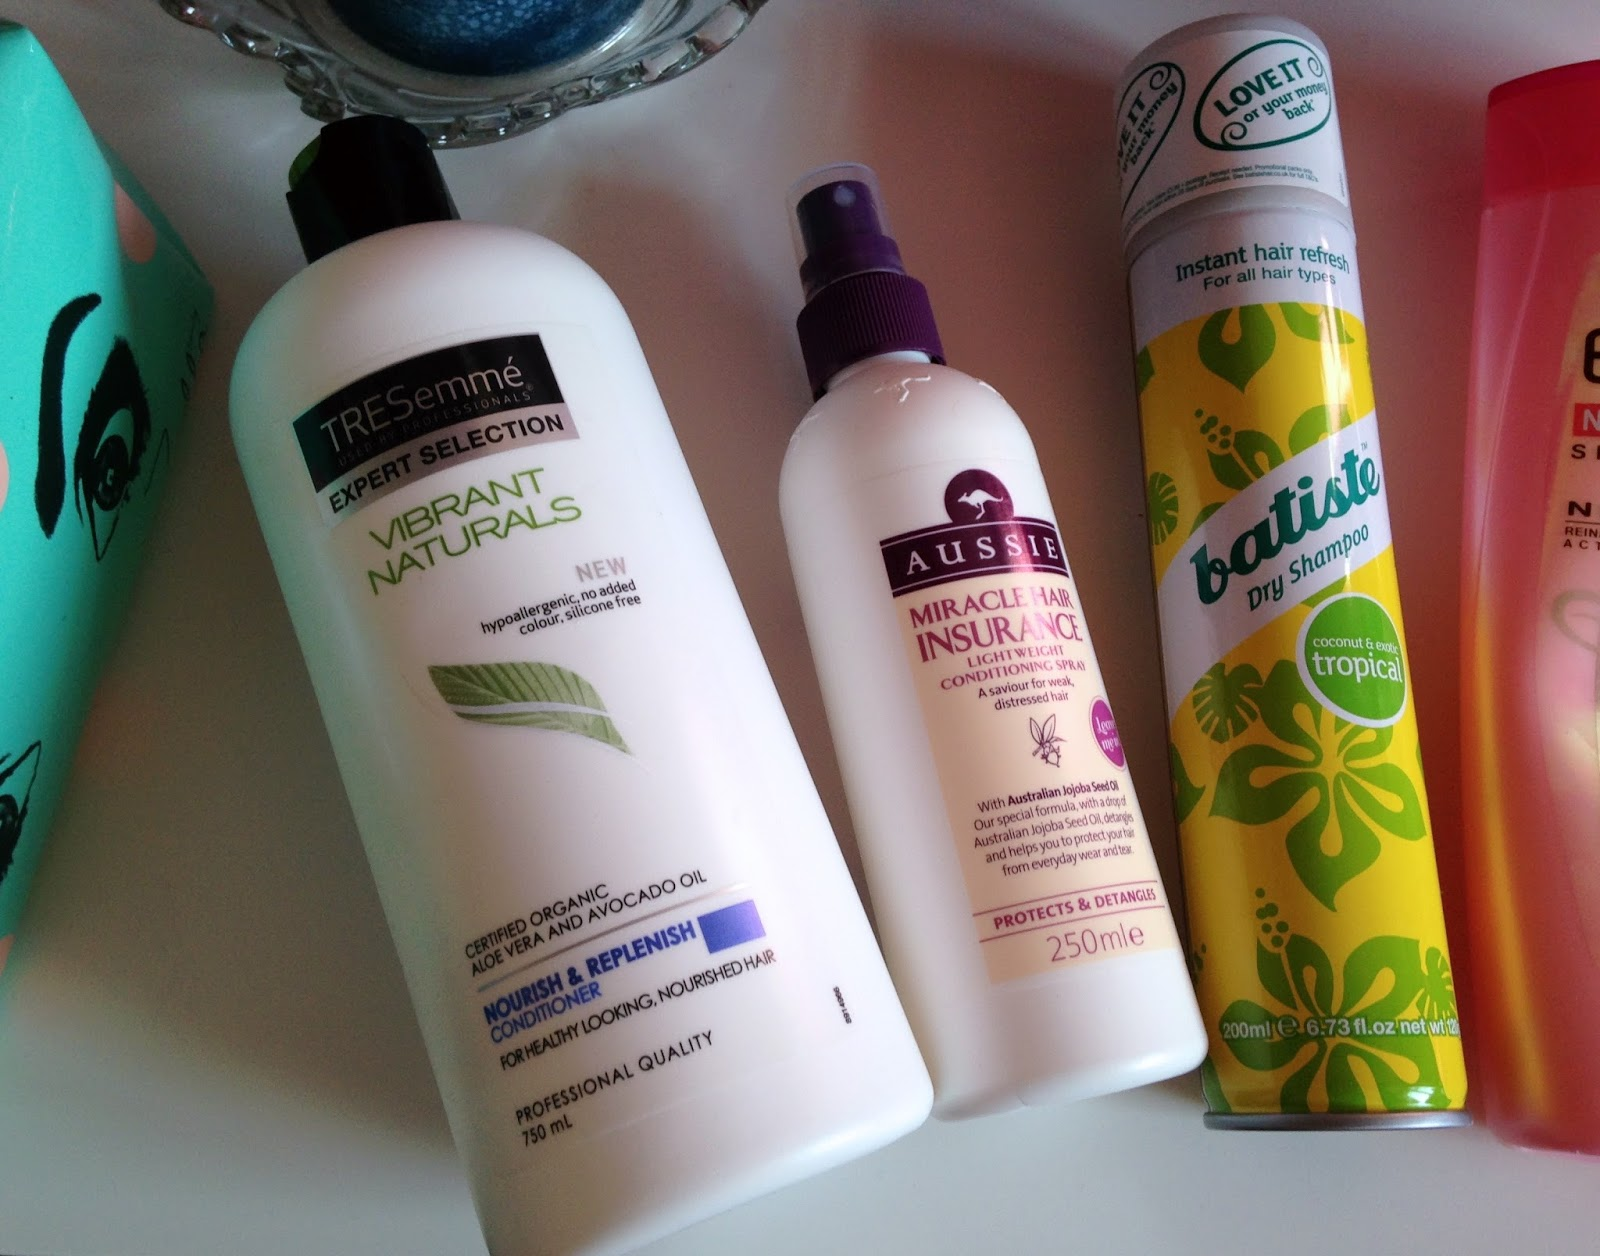 TRESemmé Vibrant Naturals Aussie Miracle Hair Insurance Batiste Tropical